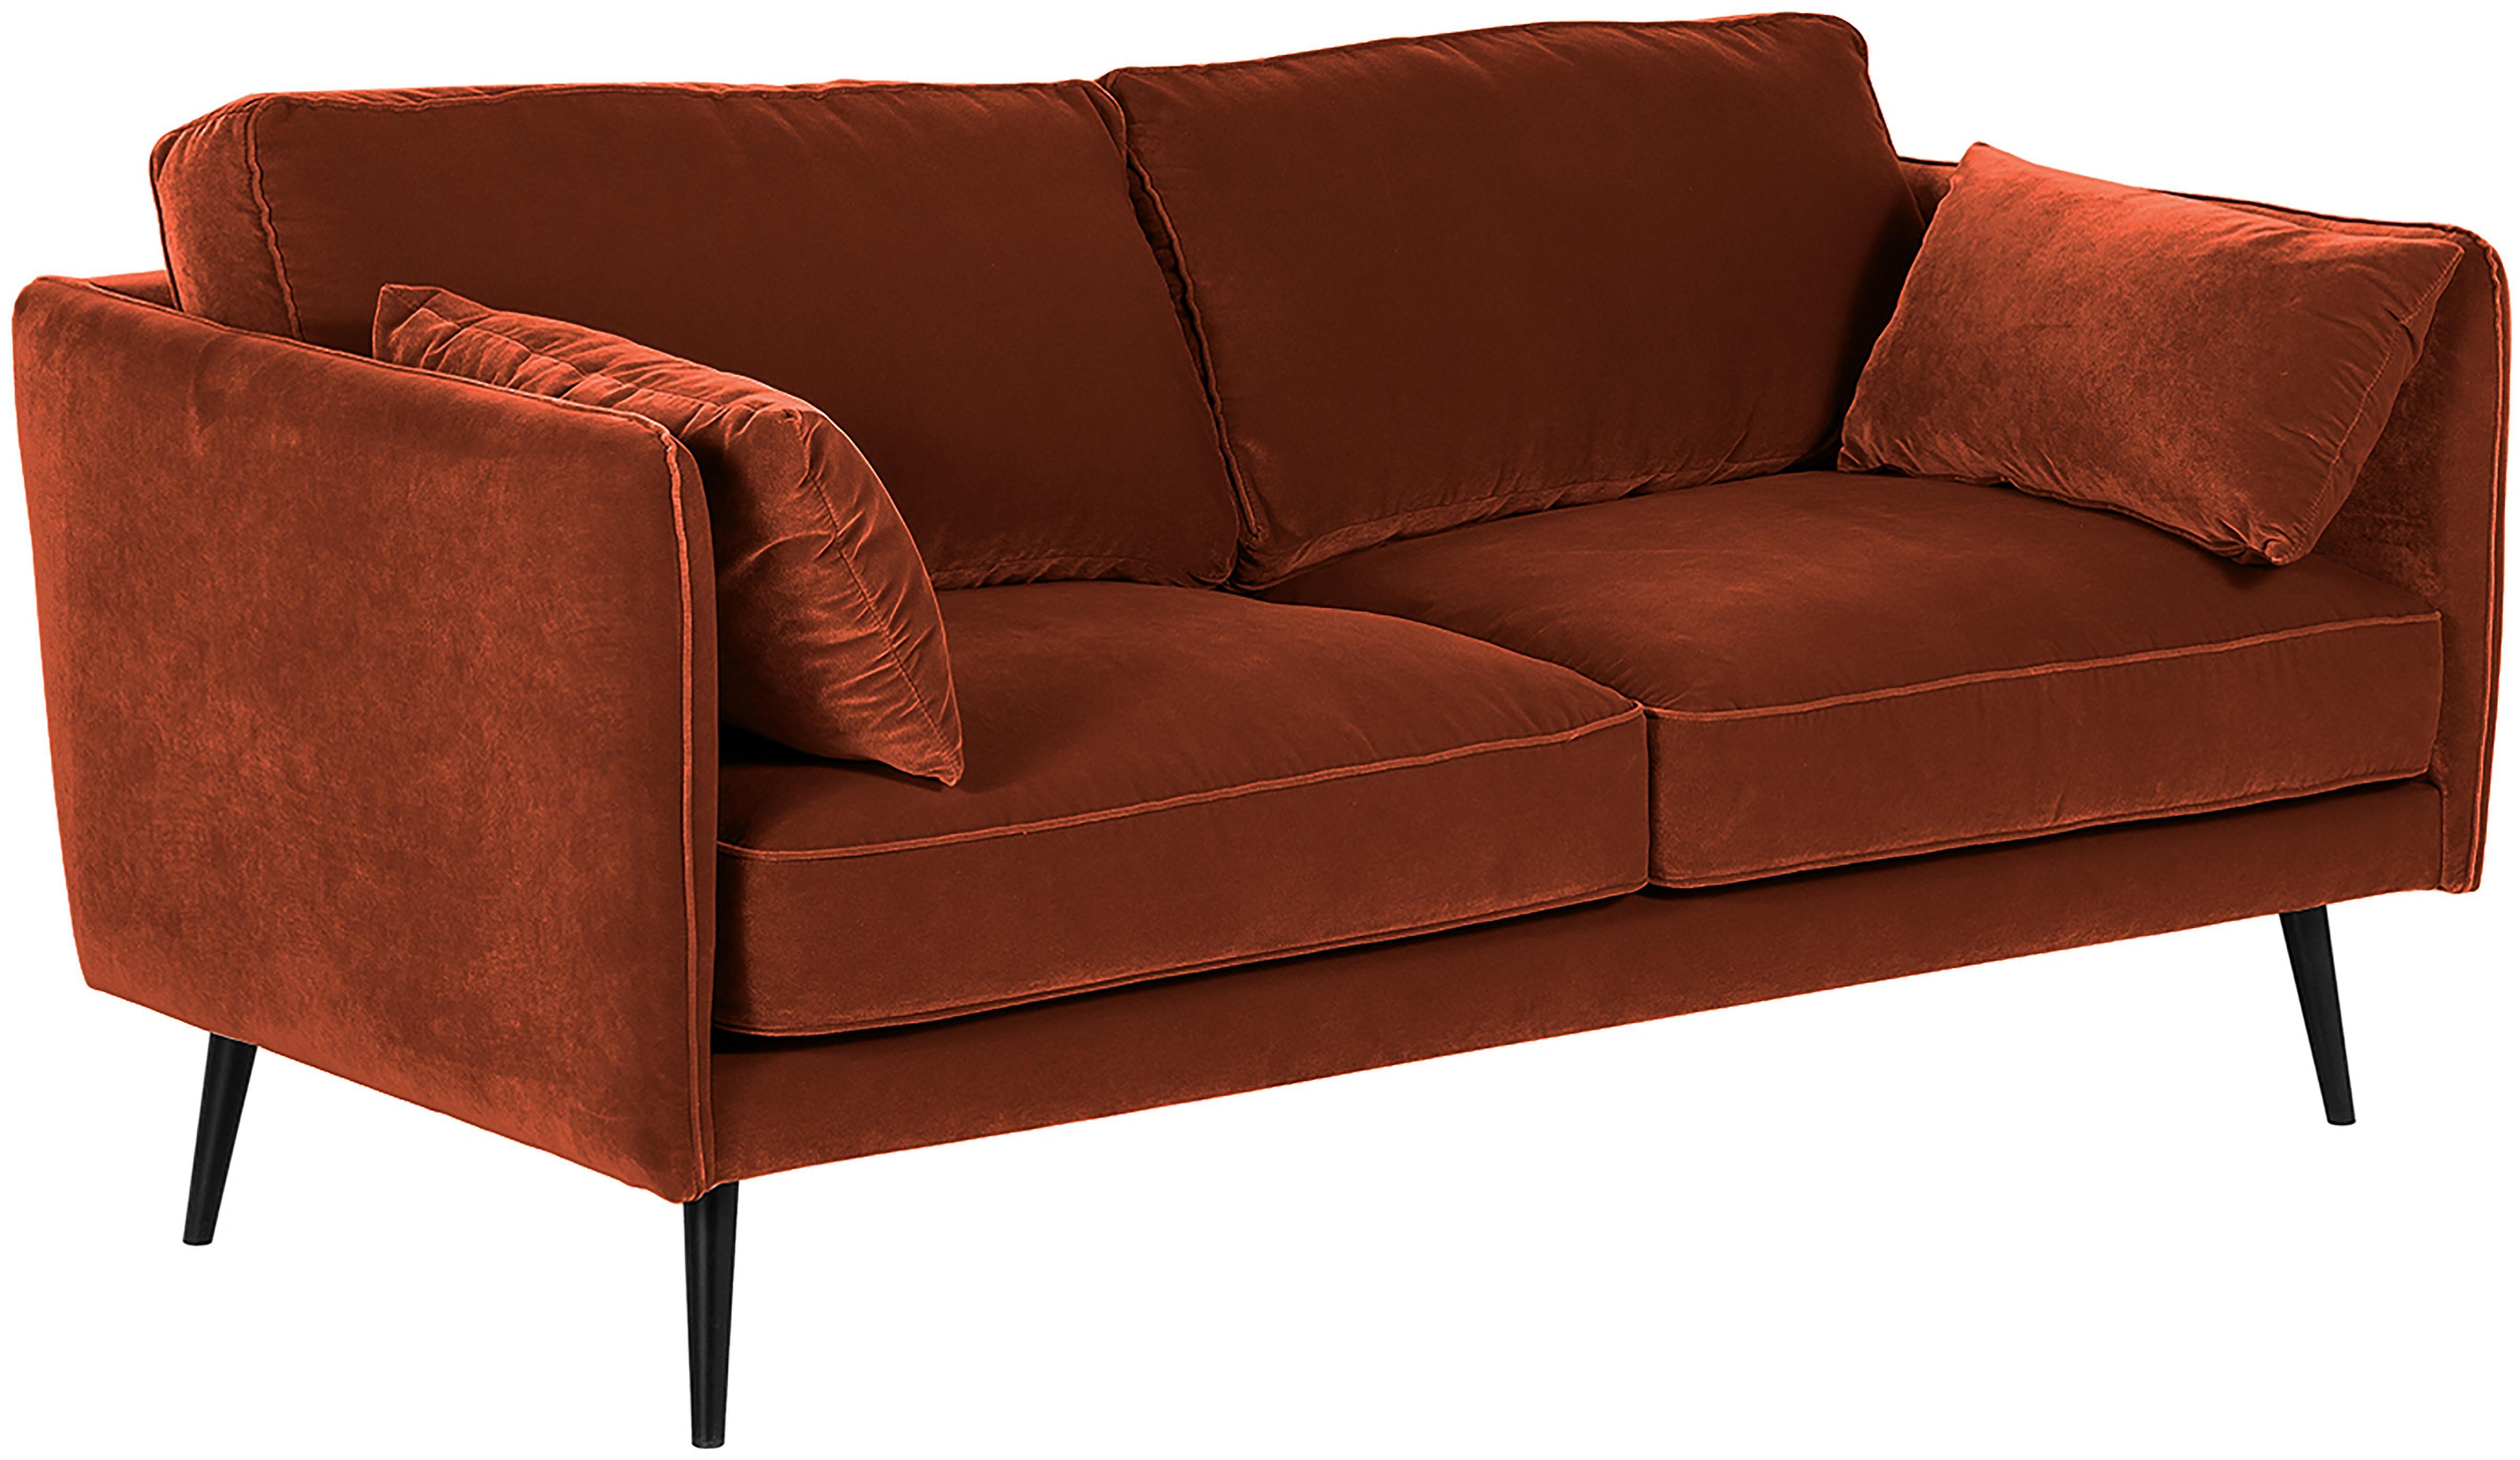 Fluwelen bank Paola (2-zits), Bekleding: fluweel (polyester), Frame: massief grenenhout, spaan, Poten: gelakt grenenhout Het FSC, Roodbruin, B 179 x D 95 cm